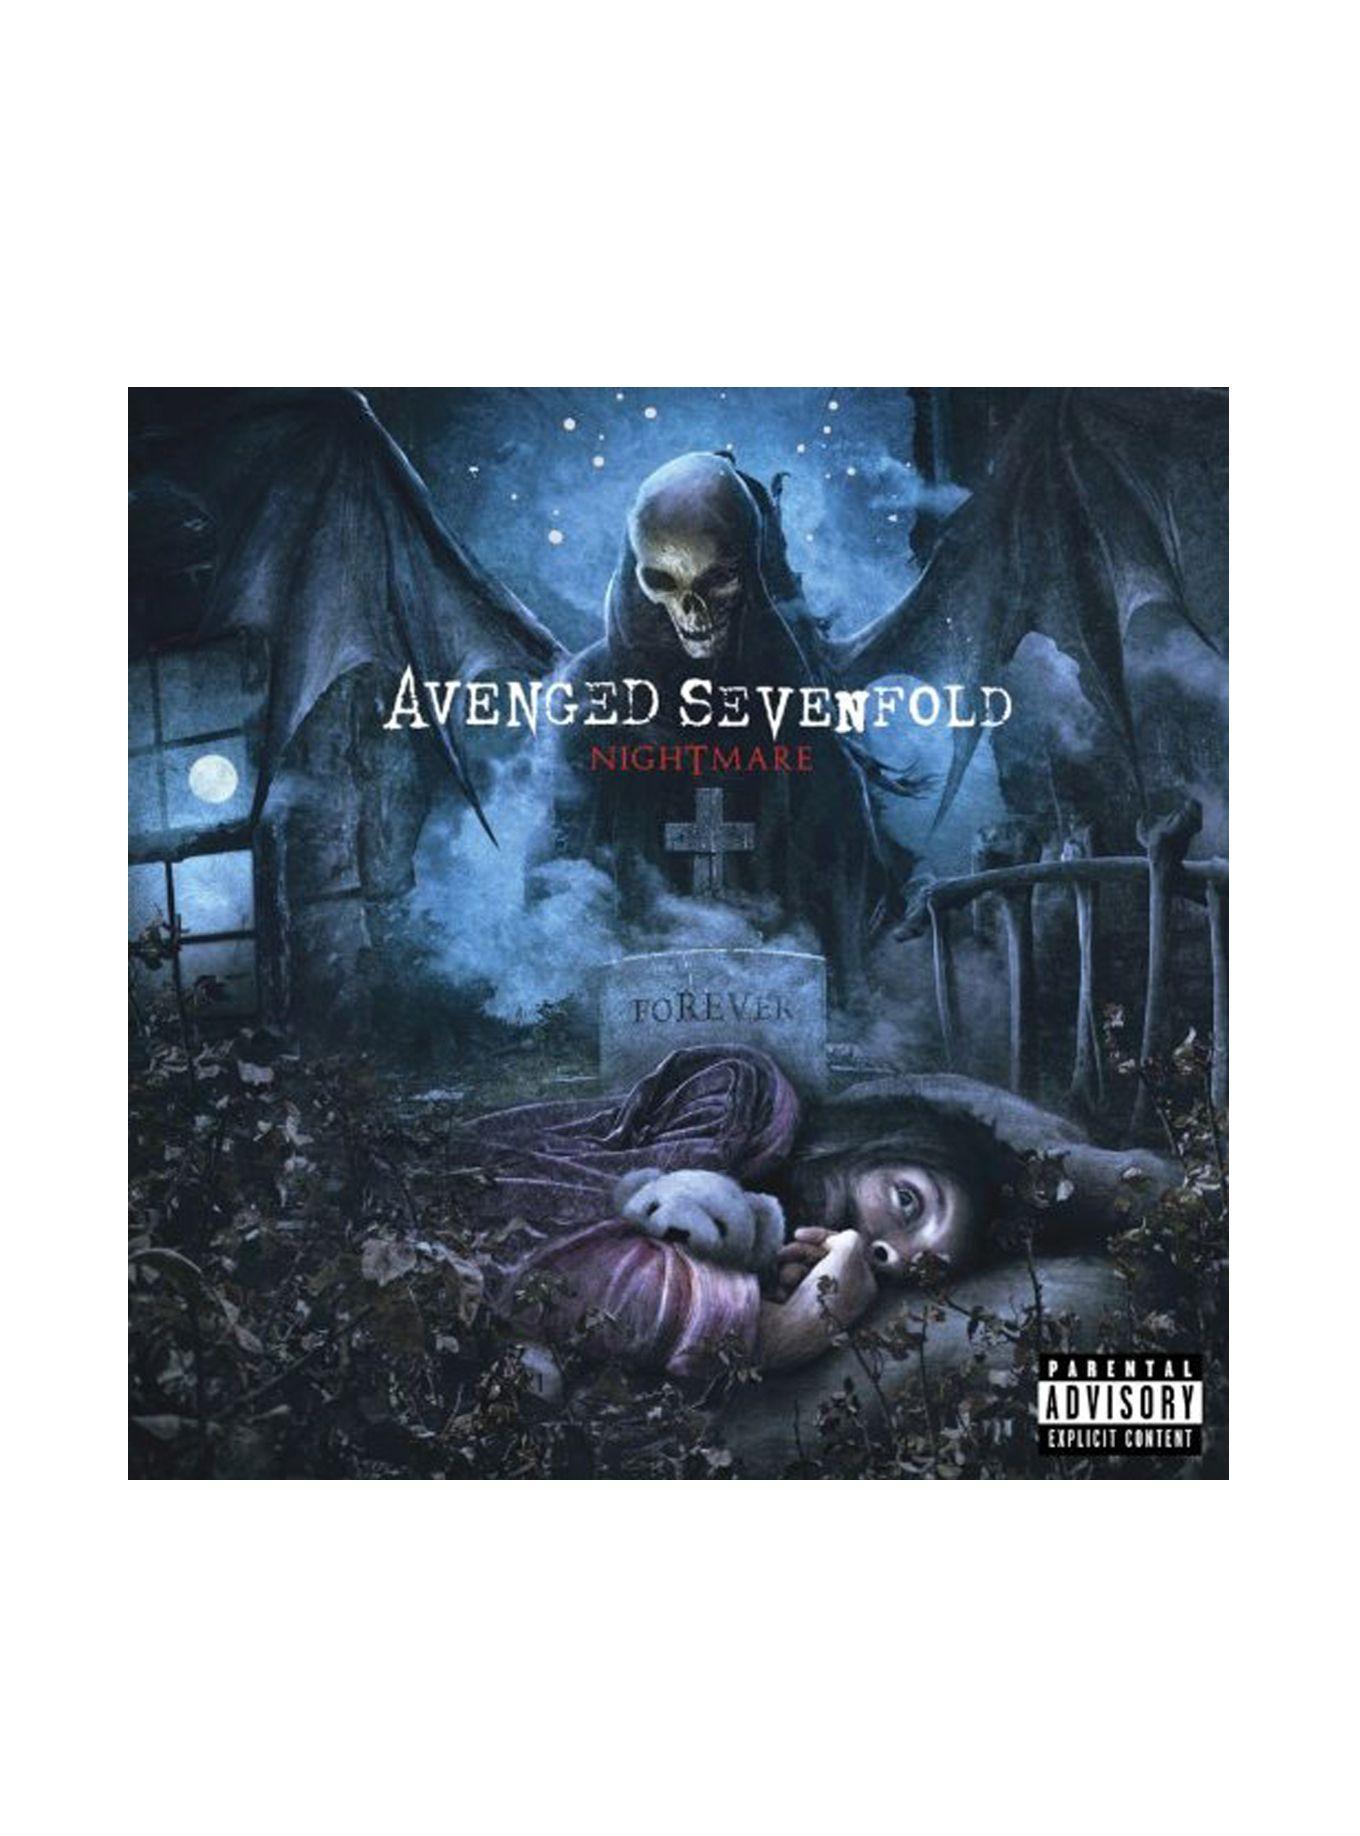 Avenged Sevenfold Nightmare Vinyl LP Hot Topic